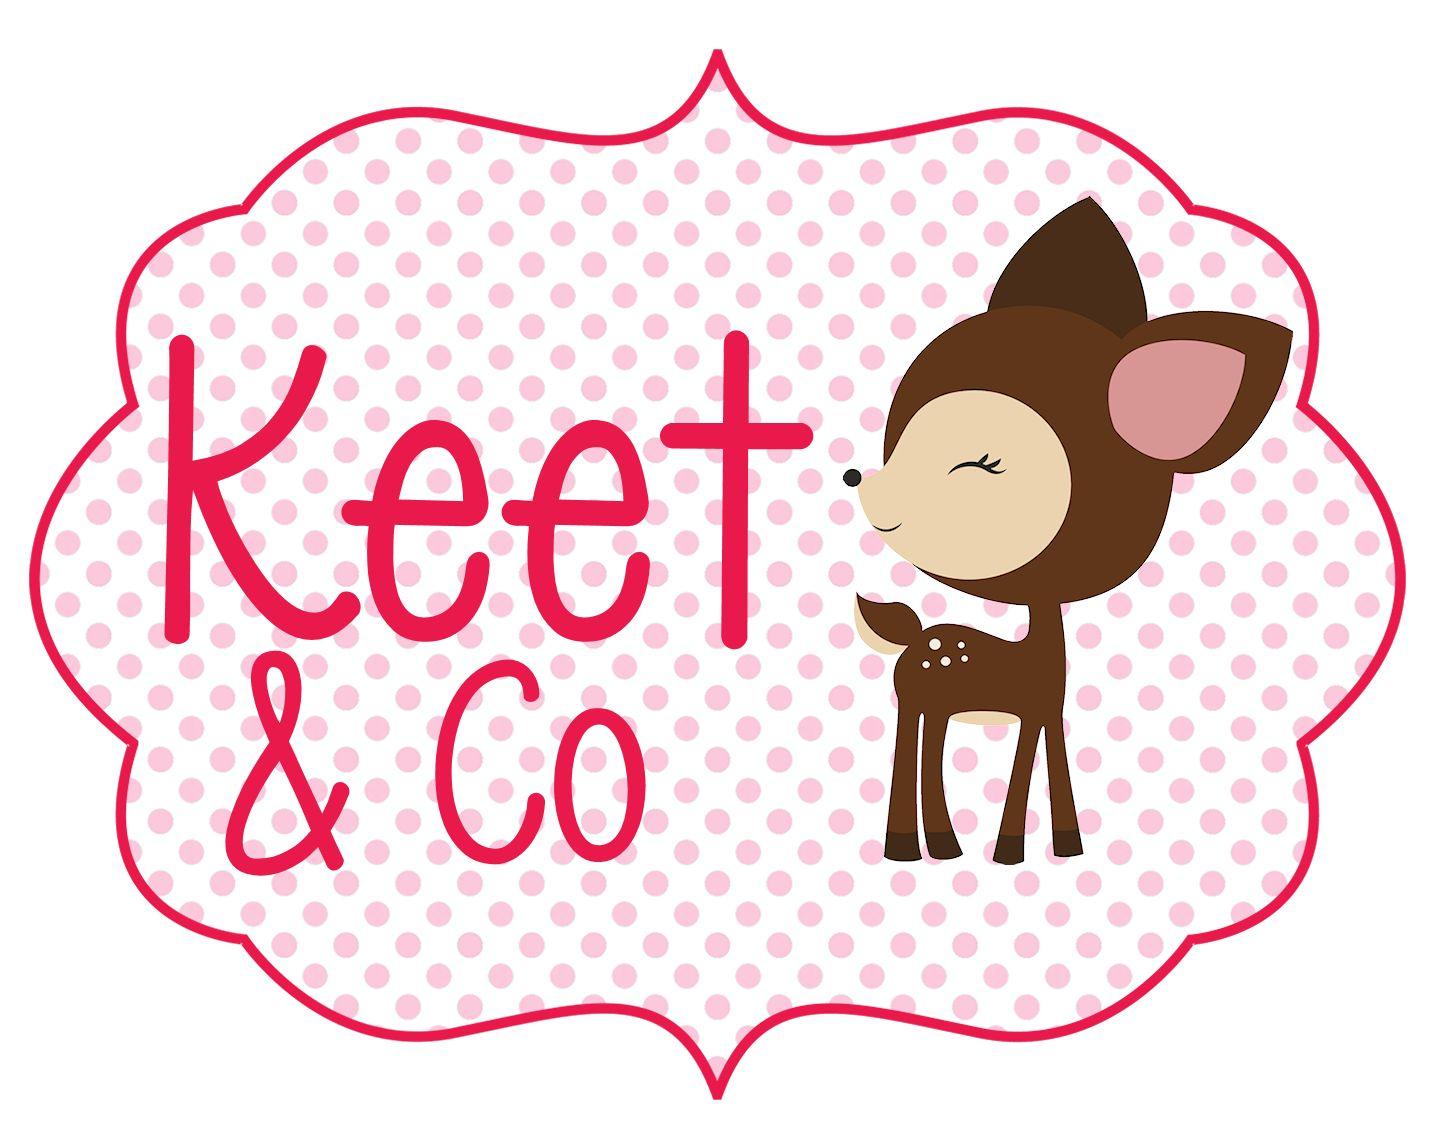 Keet&Co Logo.jpg